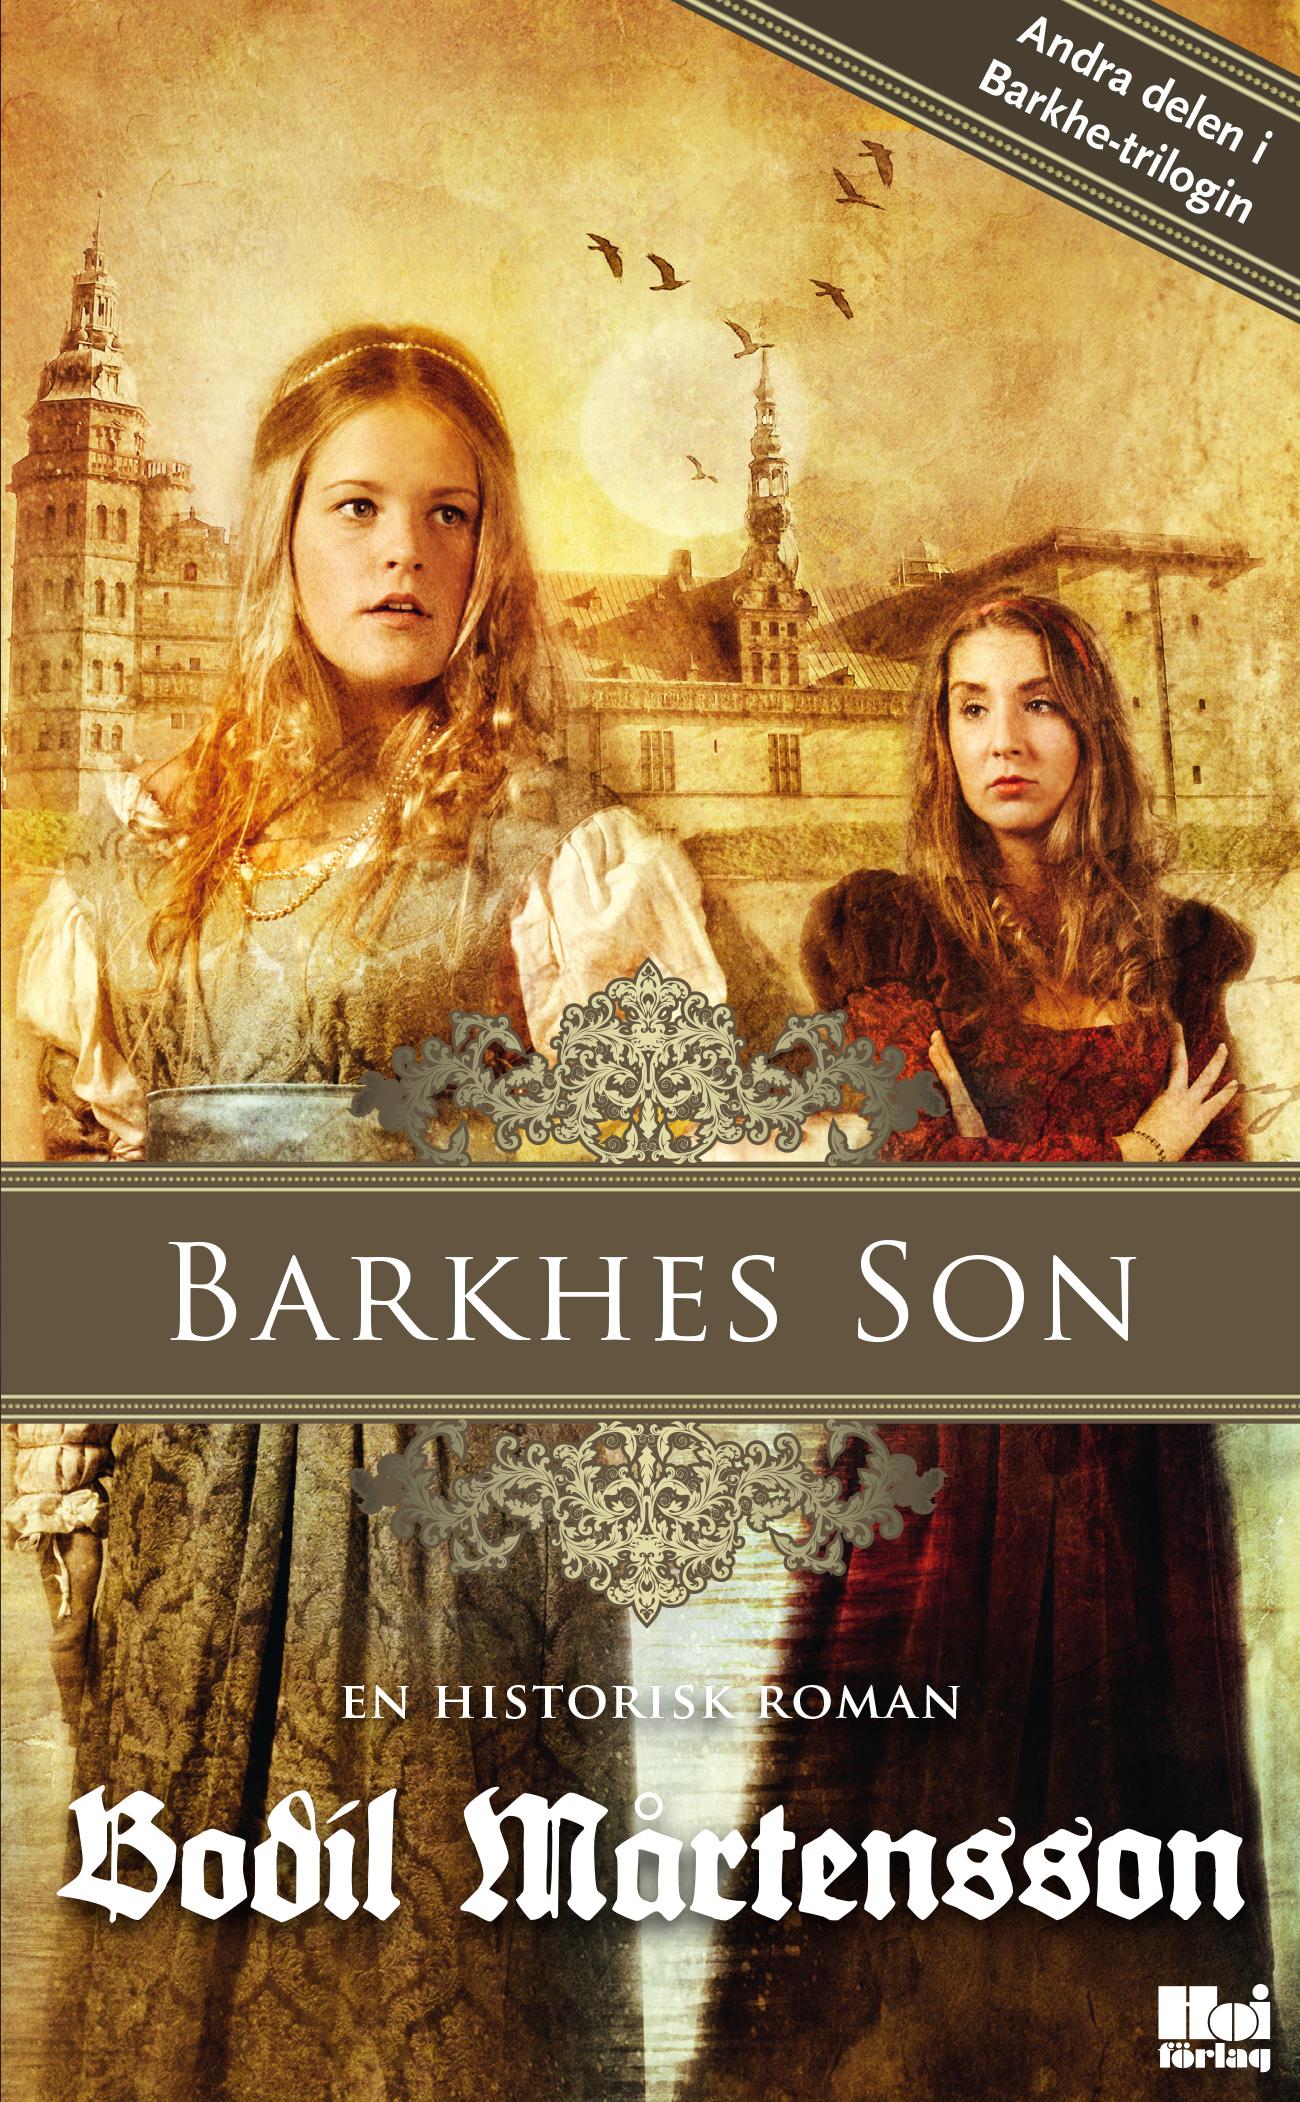 Barkhes son